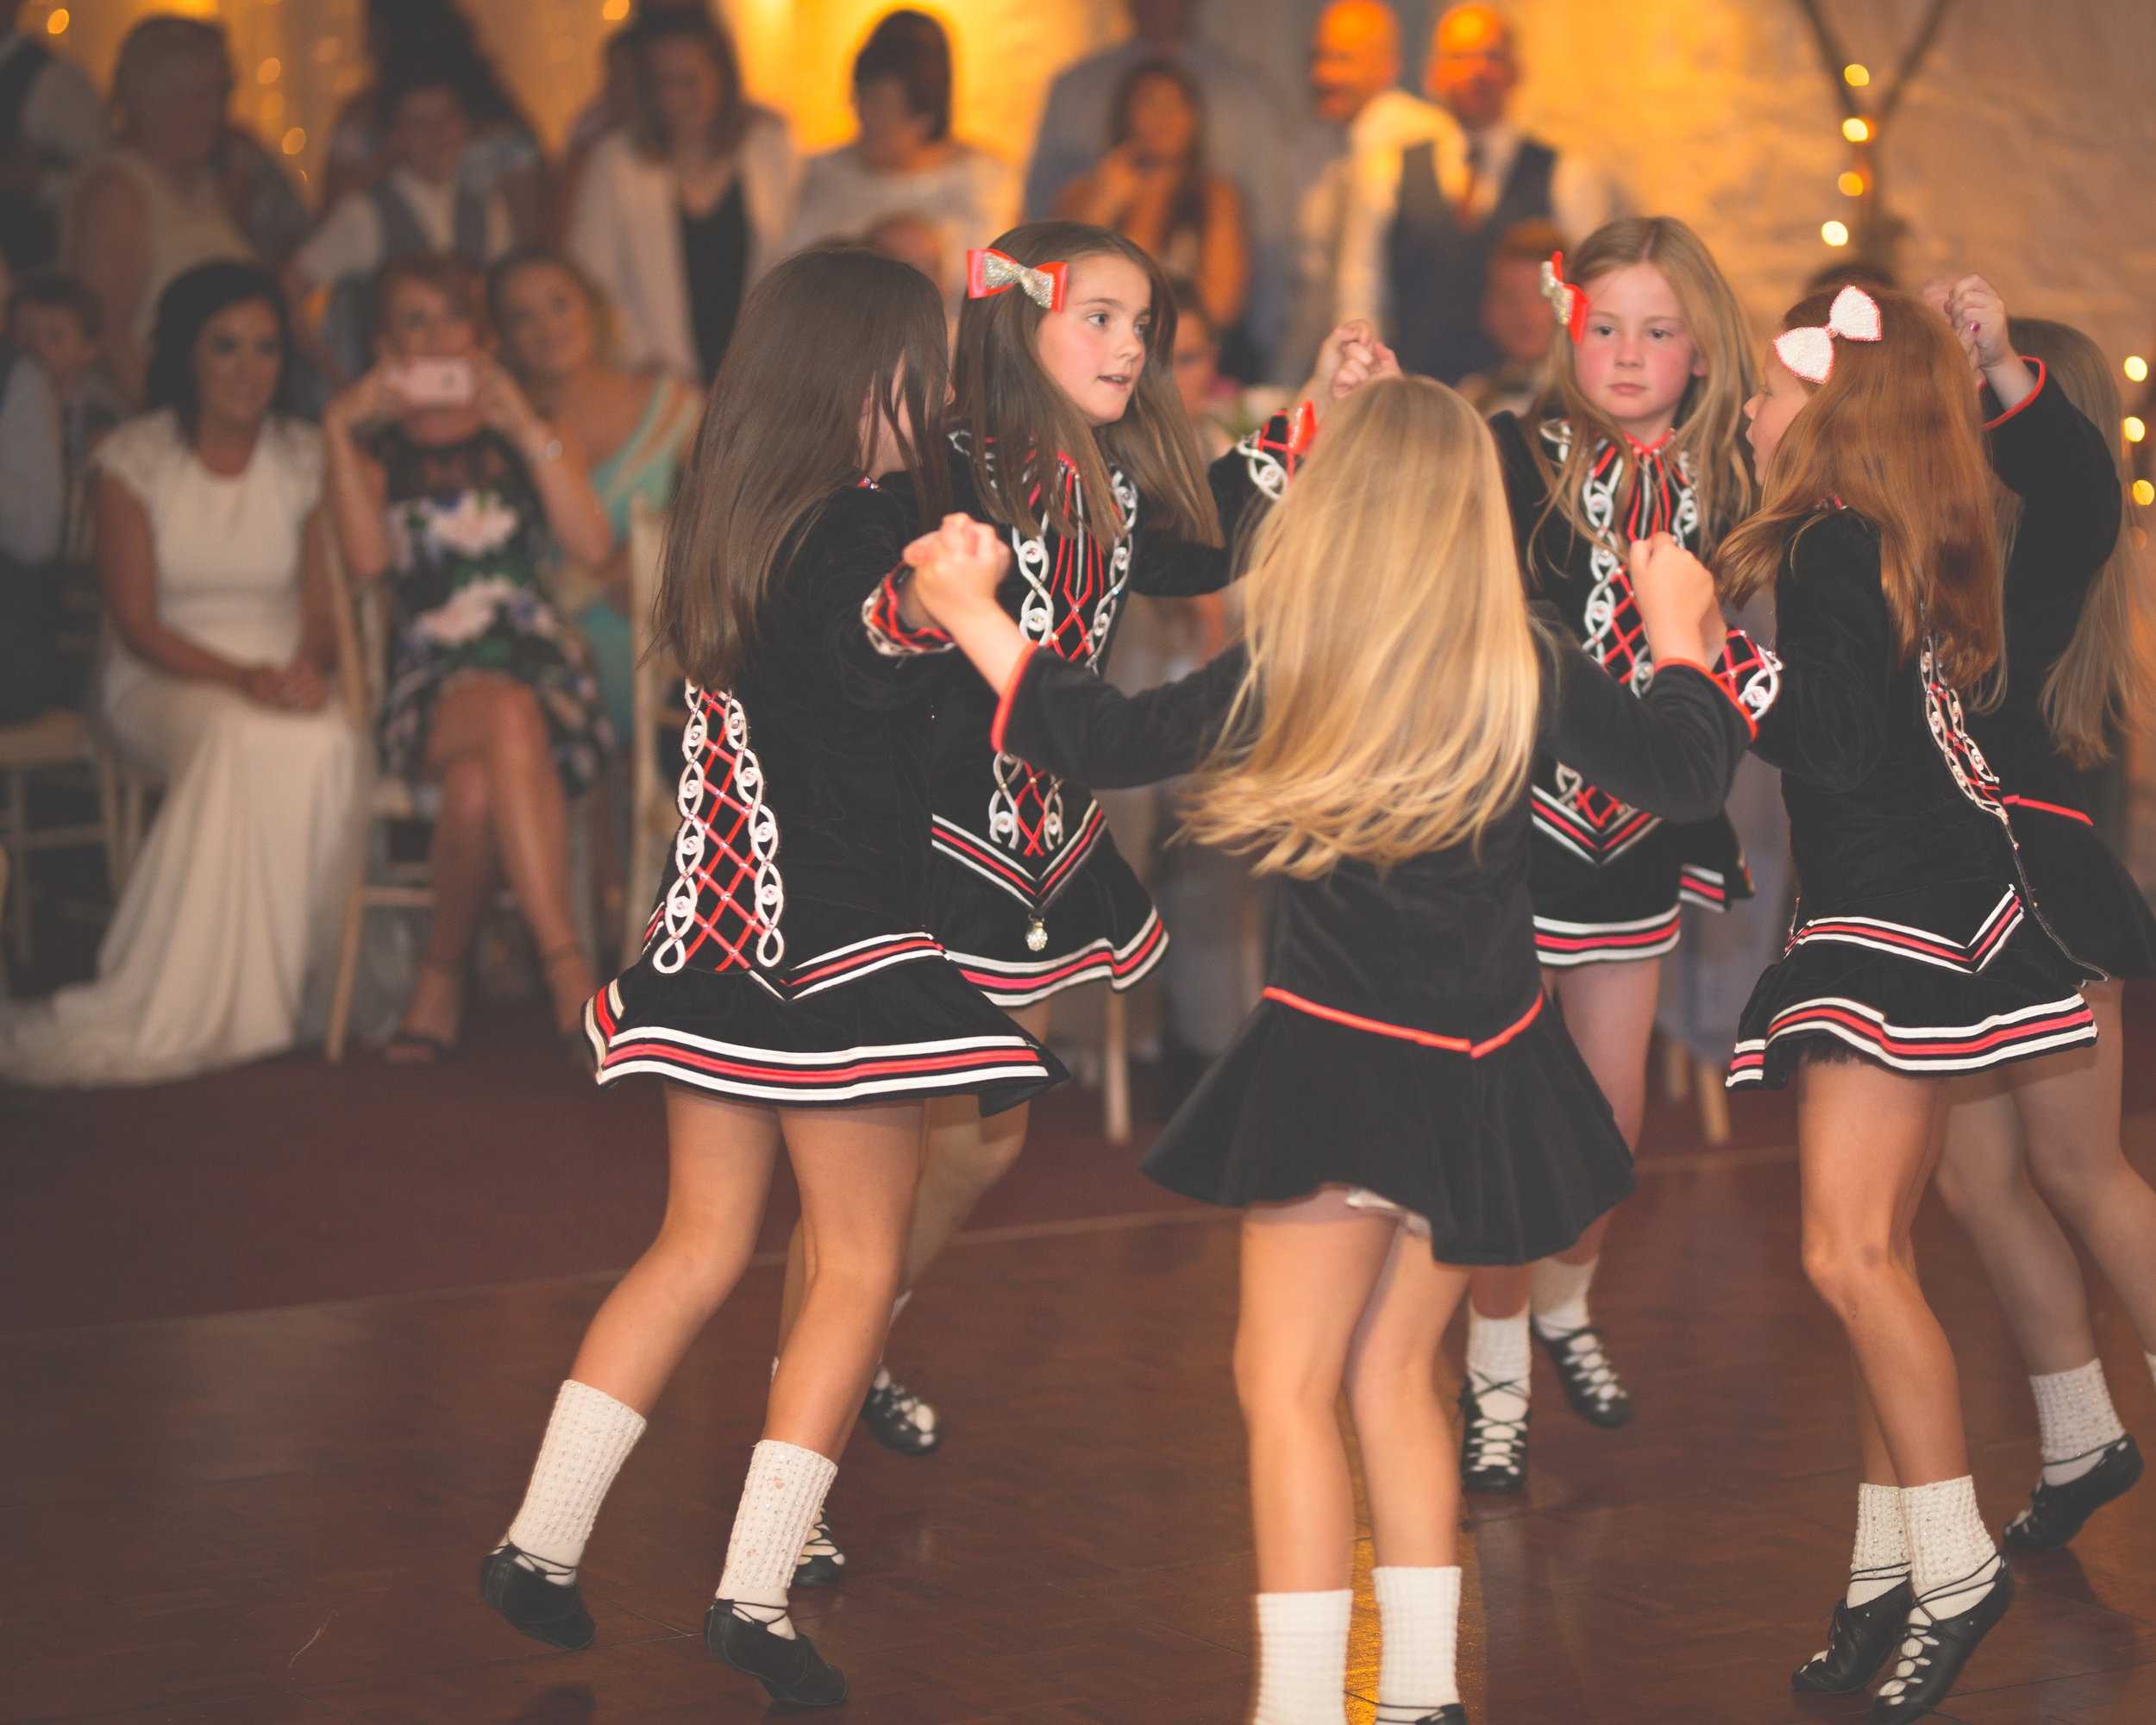 Brian McEwan Wedding Photography | Carol-Annee & Sean | The Dancing-16.jpg